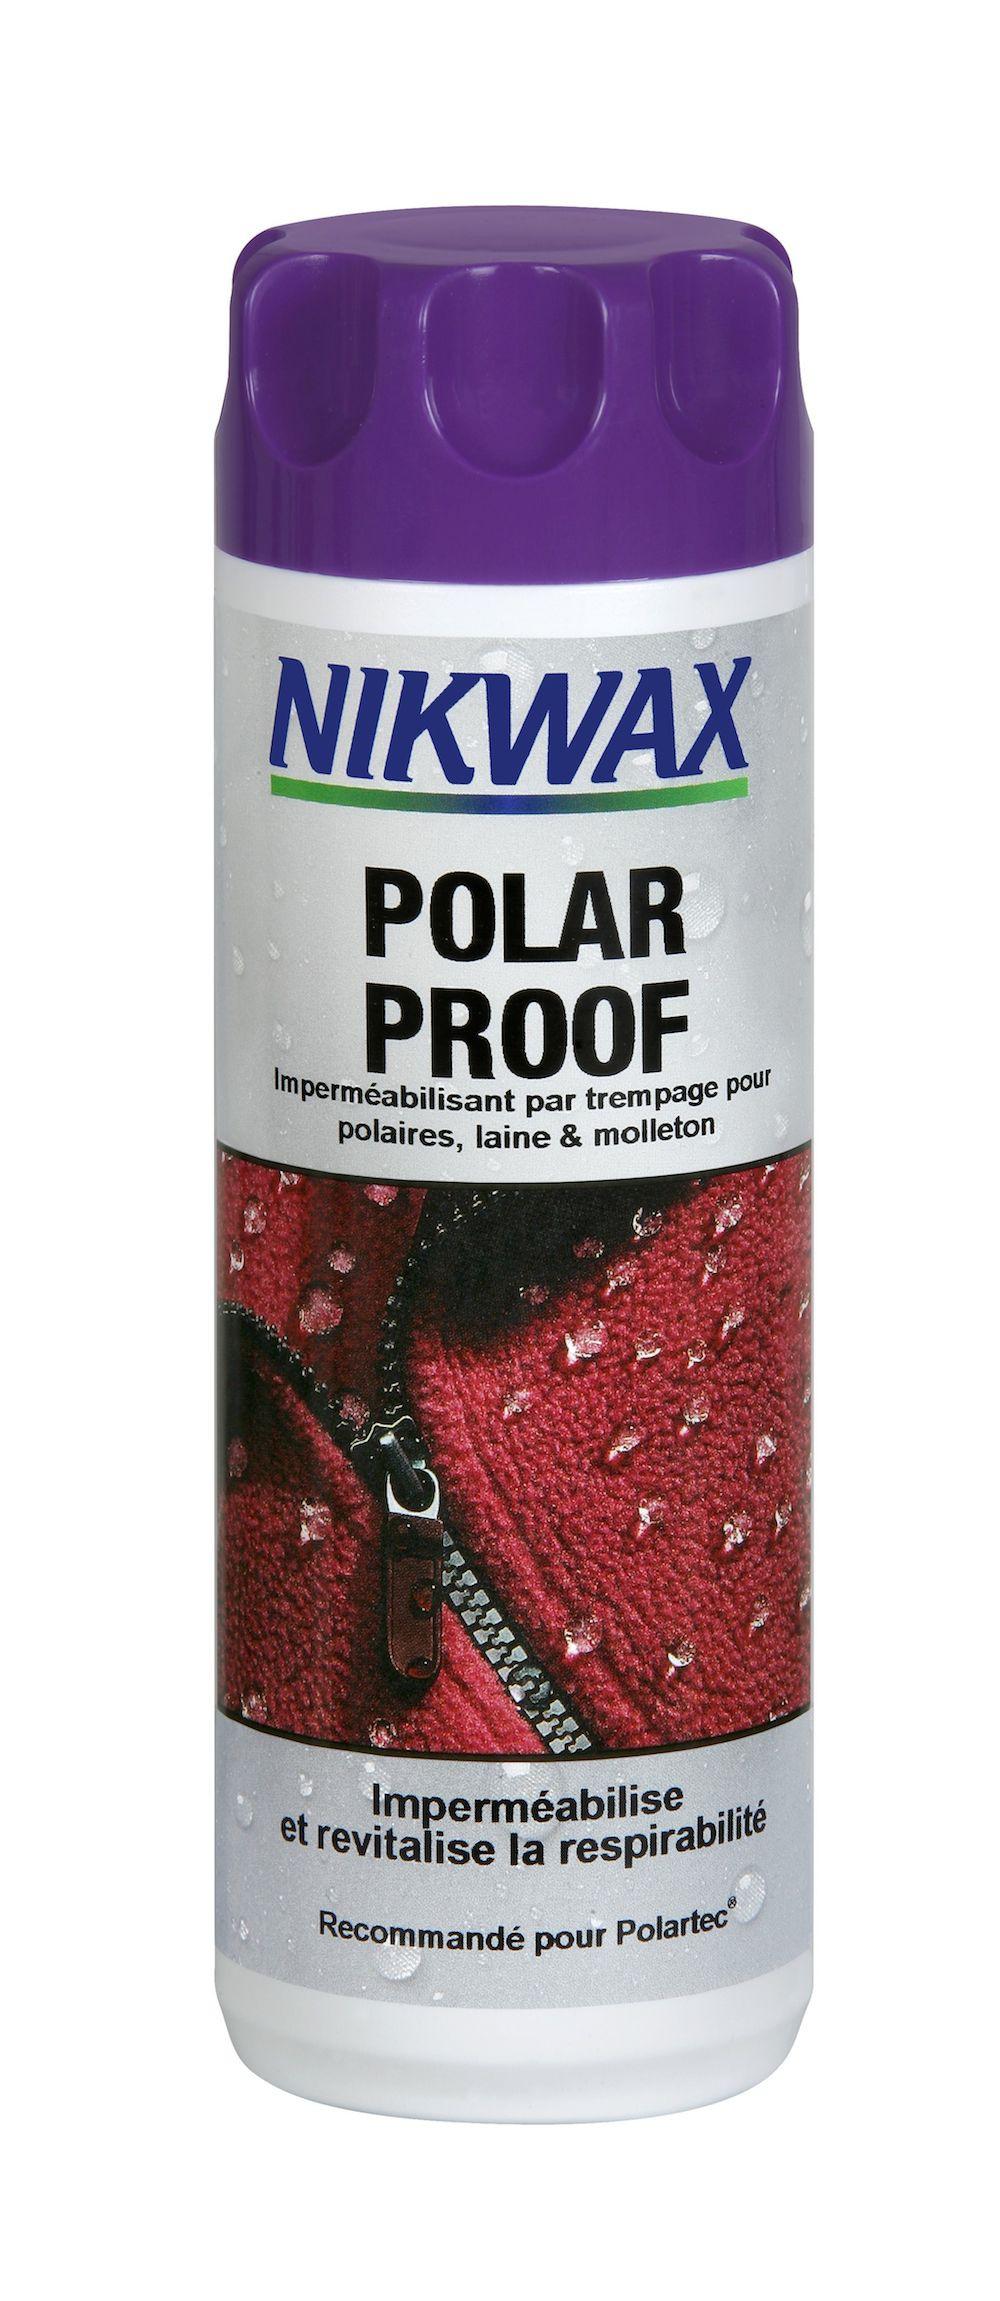 Nikwax Polar Proof - Textilimprägnierung